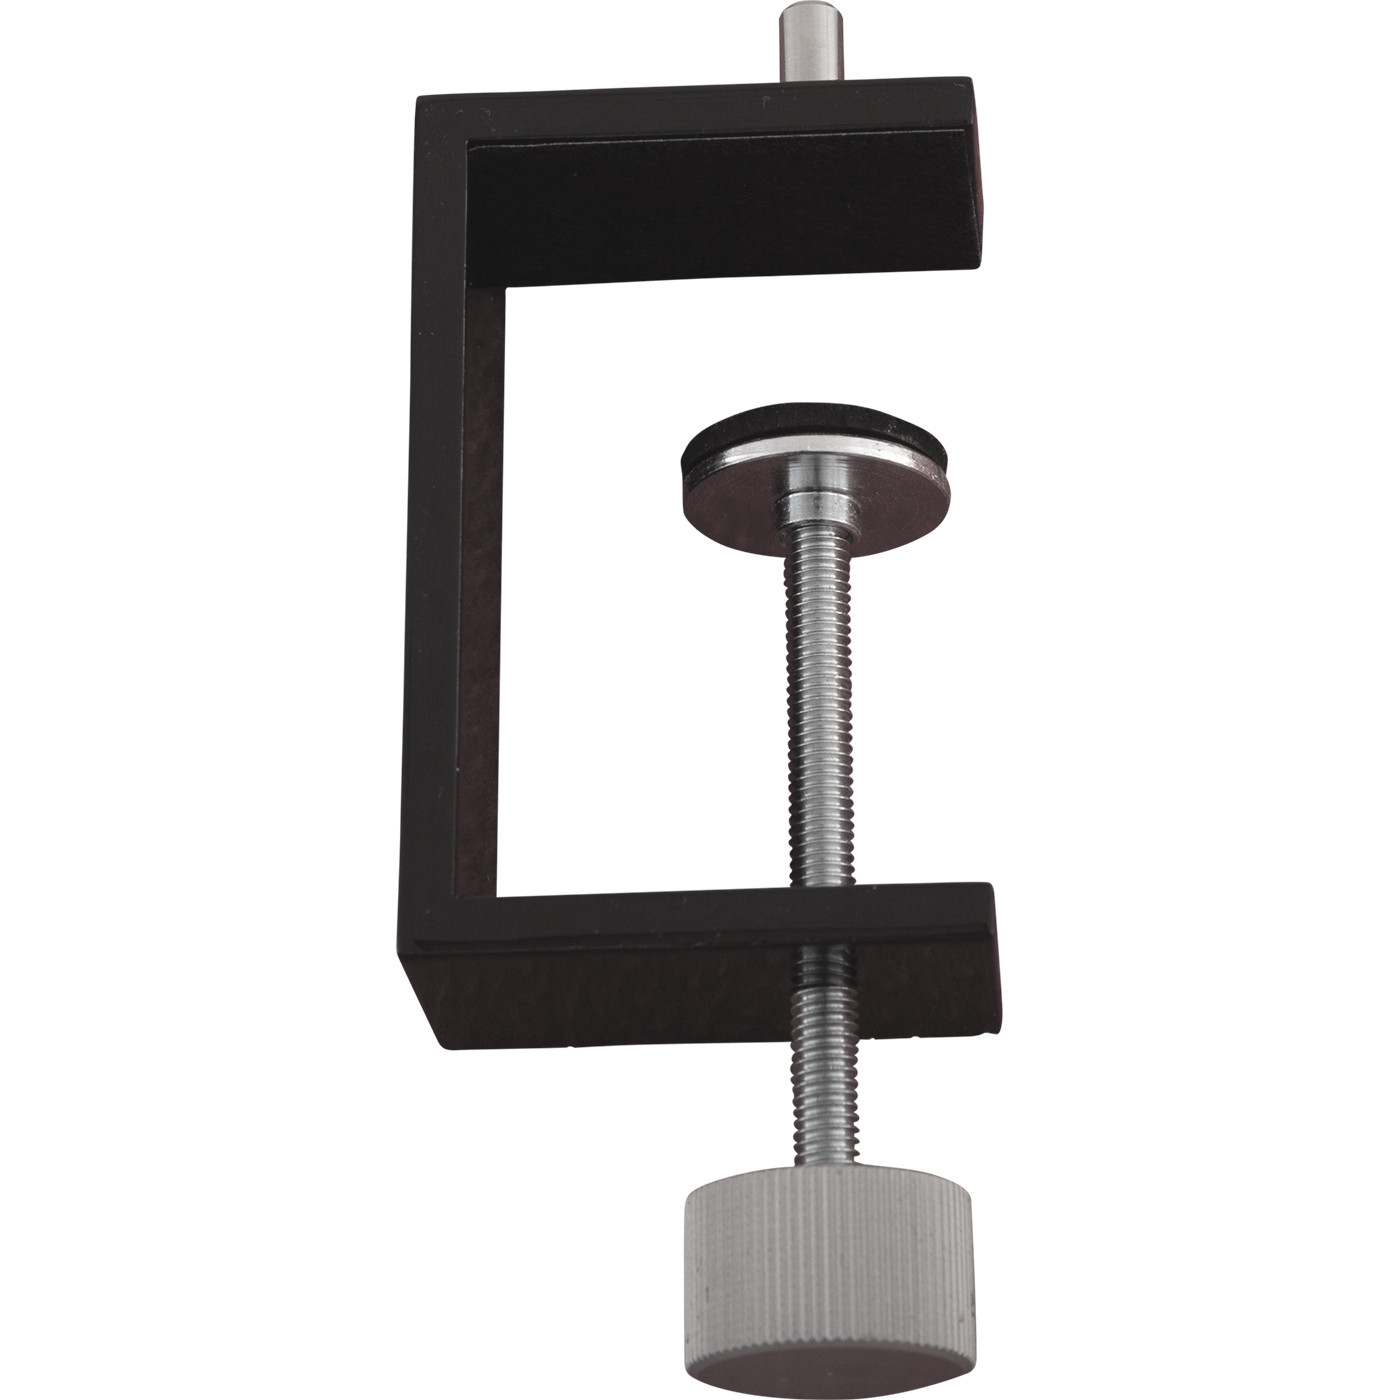 Flos Kelvin Edge LED Ersatz-Tischklemme